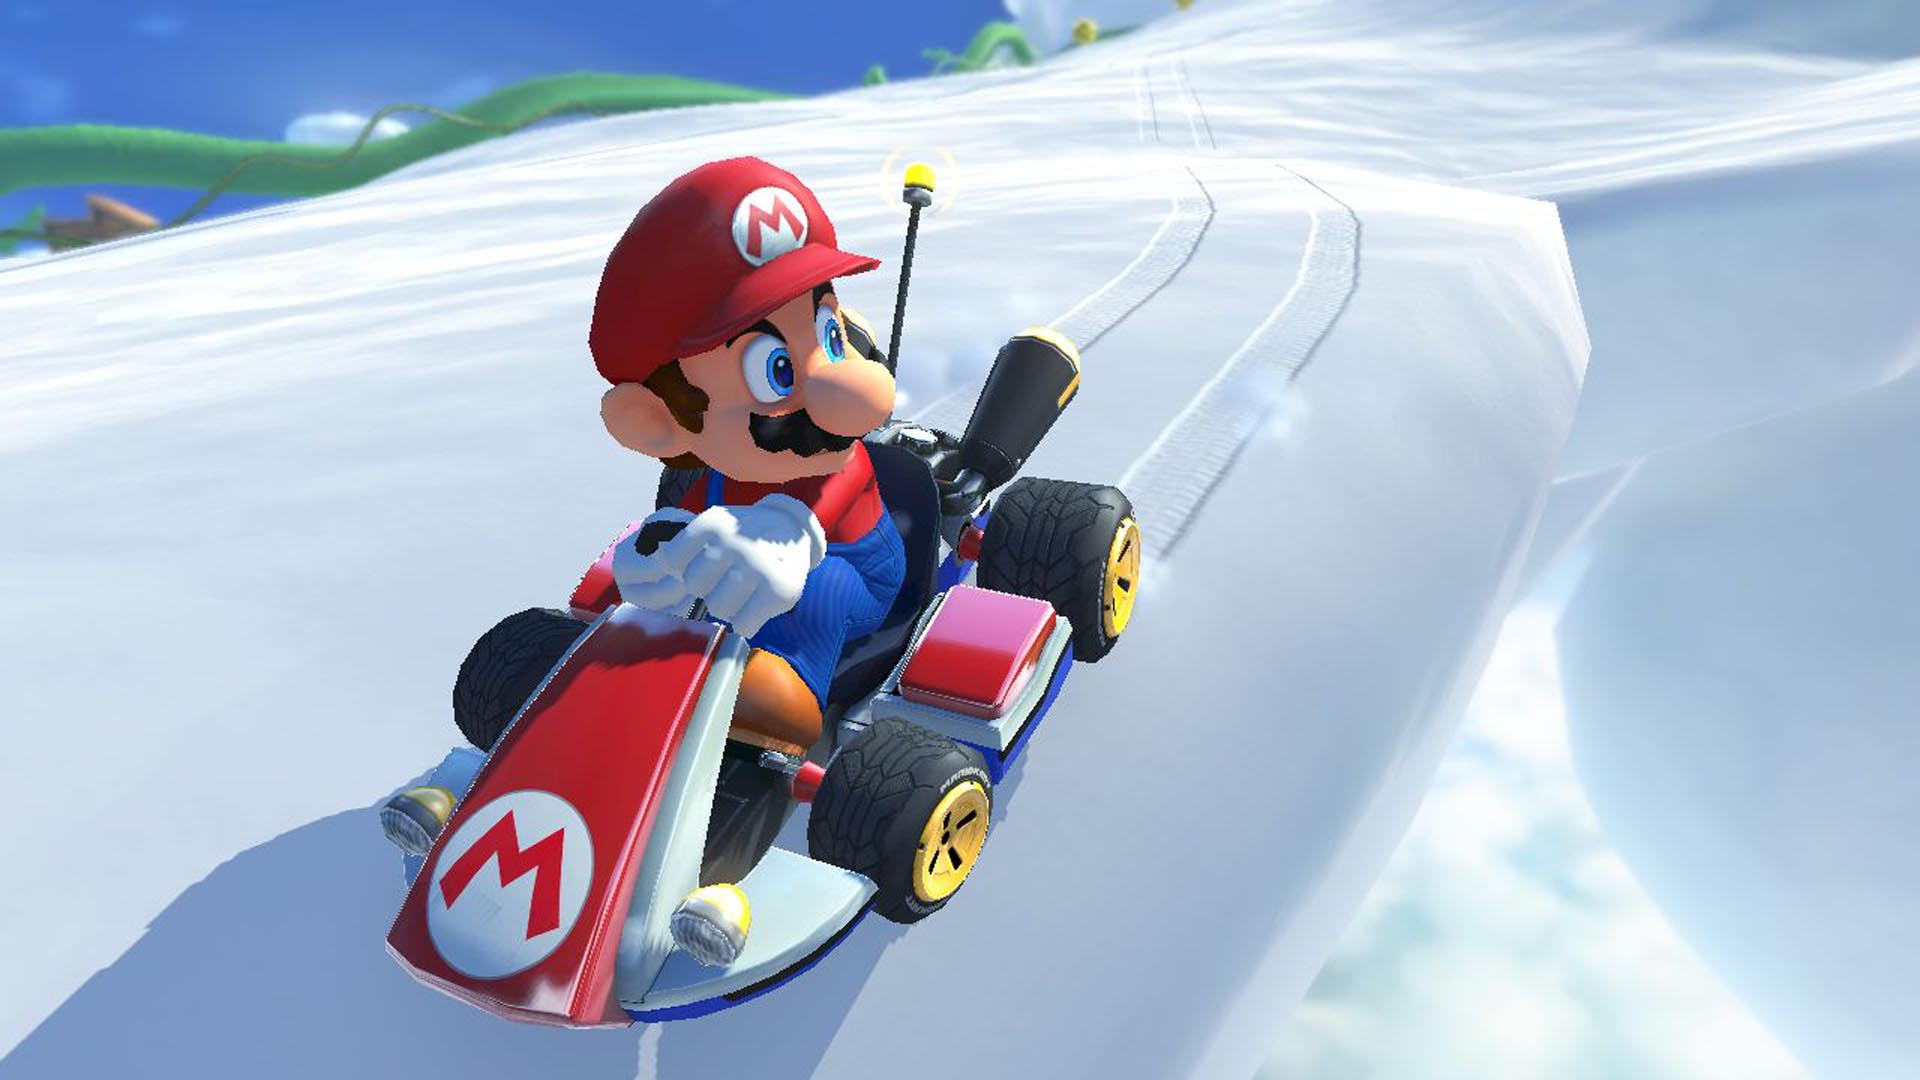 1_NintendoSwitch_MarioKart8_Screenshot_MarioKart_Presentation2017_scrn29